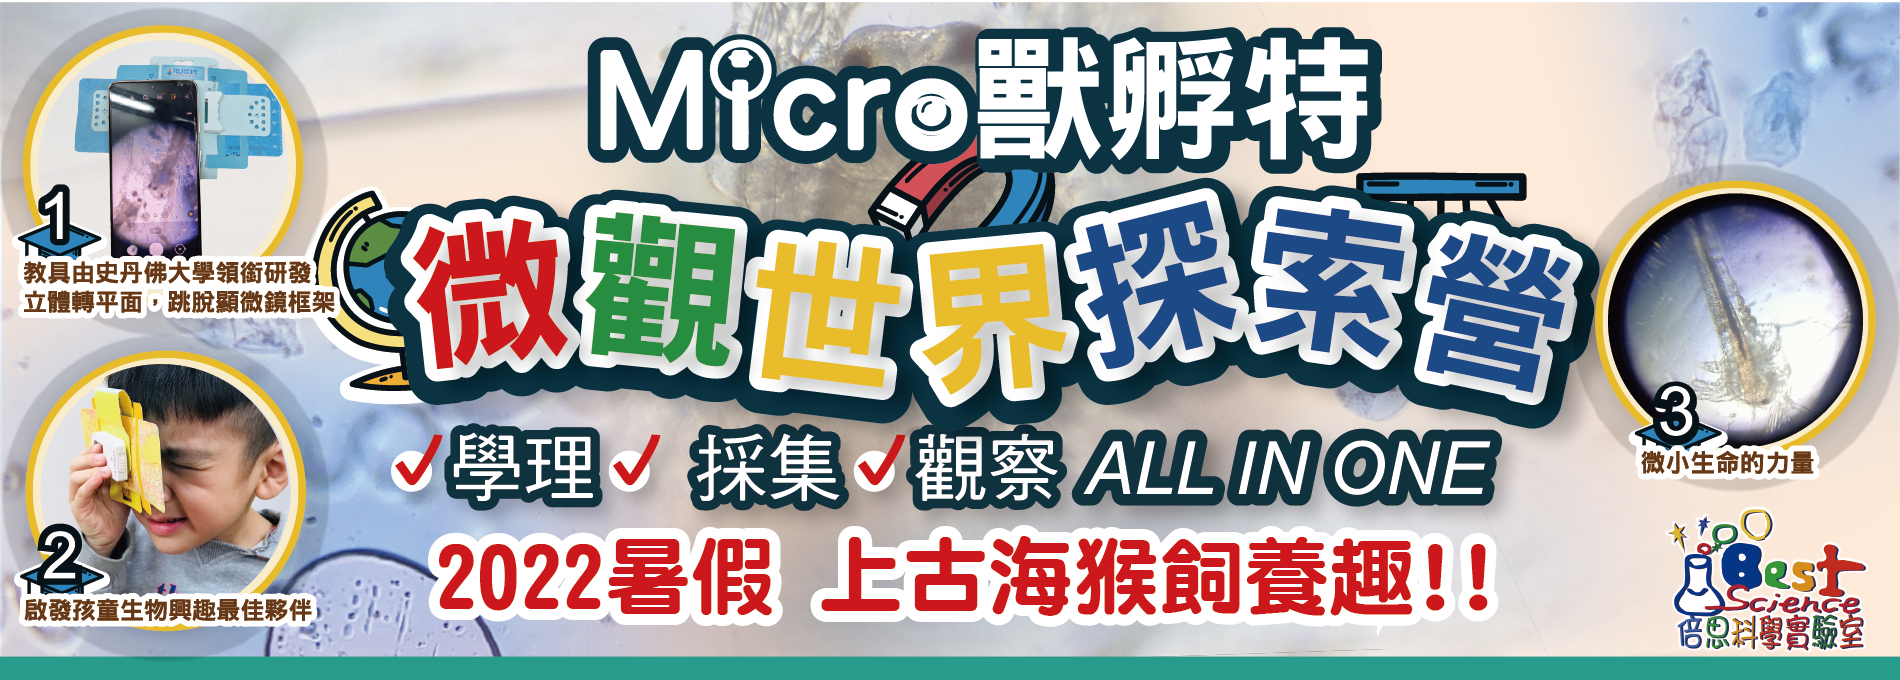 Micro獸孵特-微觀生物夏令營